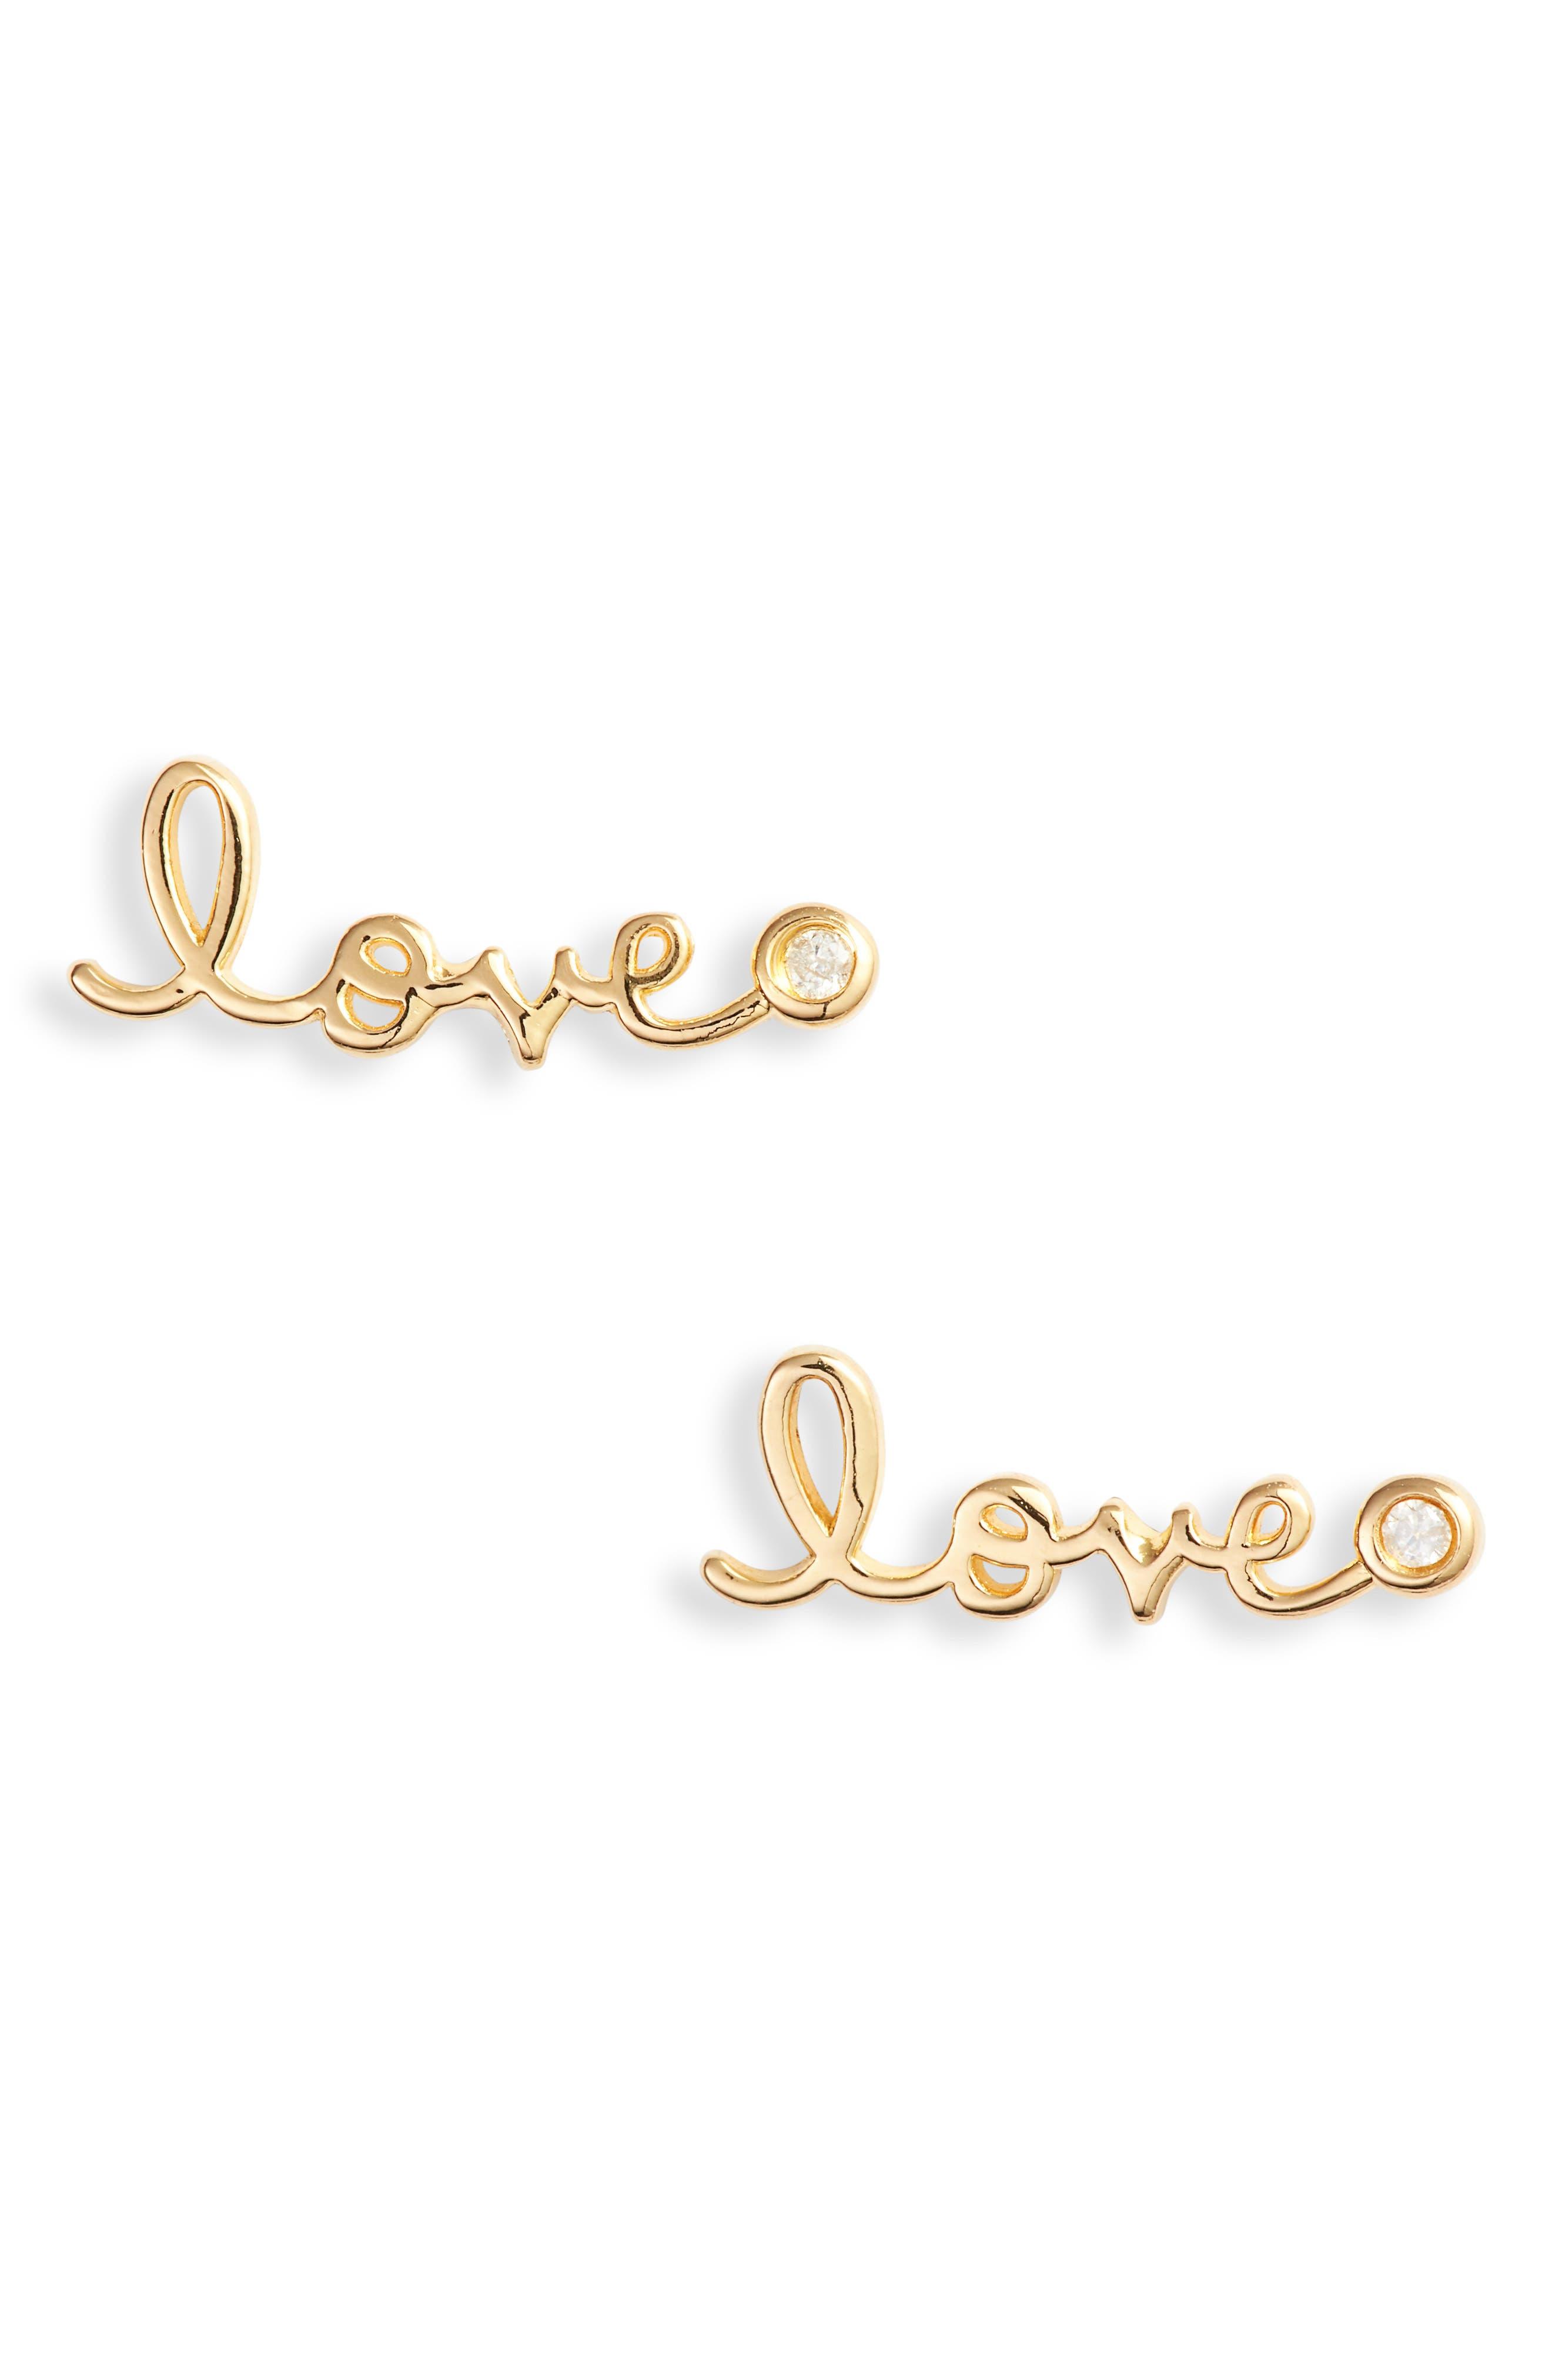 Love Diamond Stud Earrings,                             Alternate thumbnail 2, color,                             GOLD